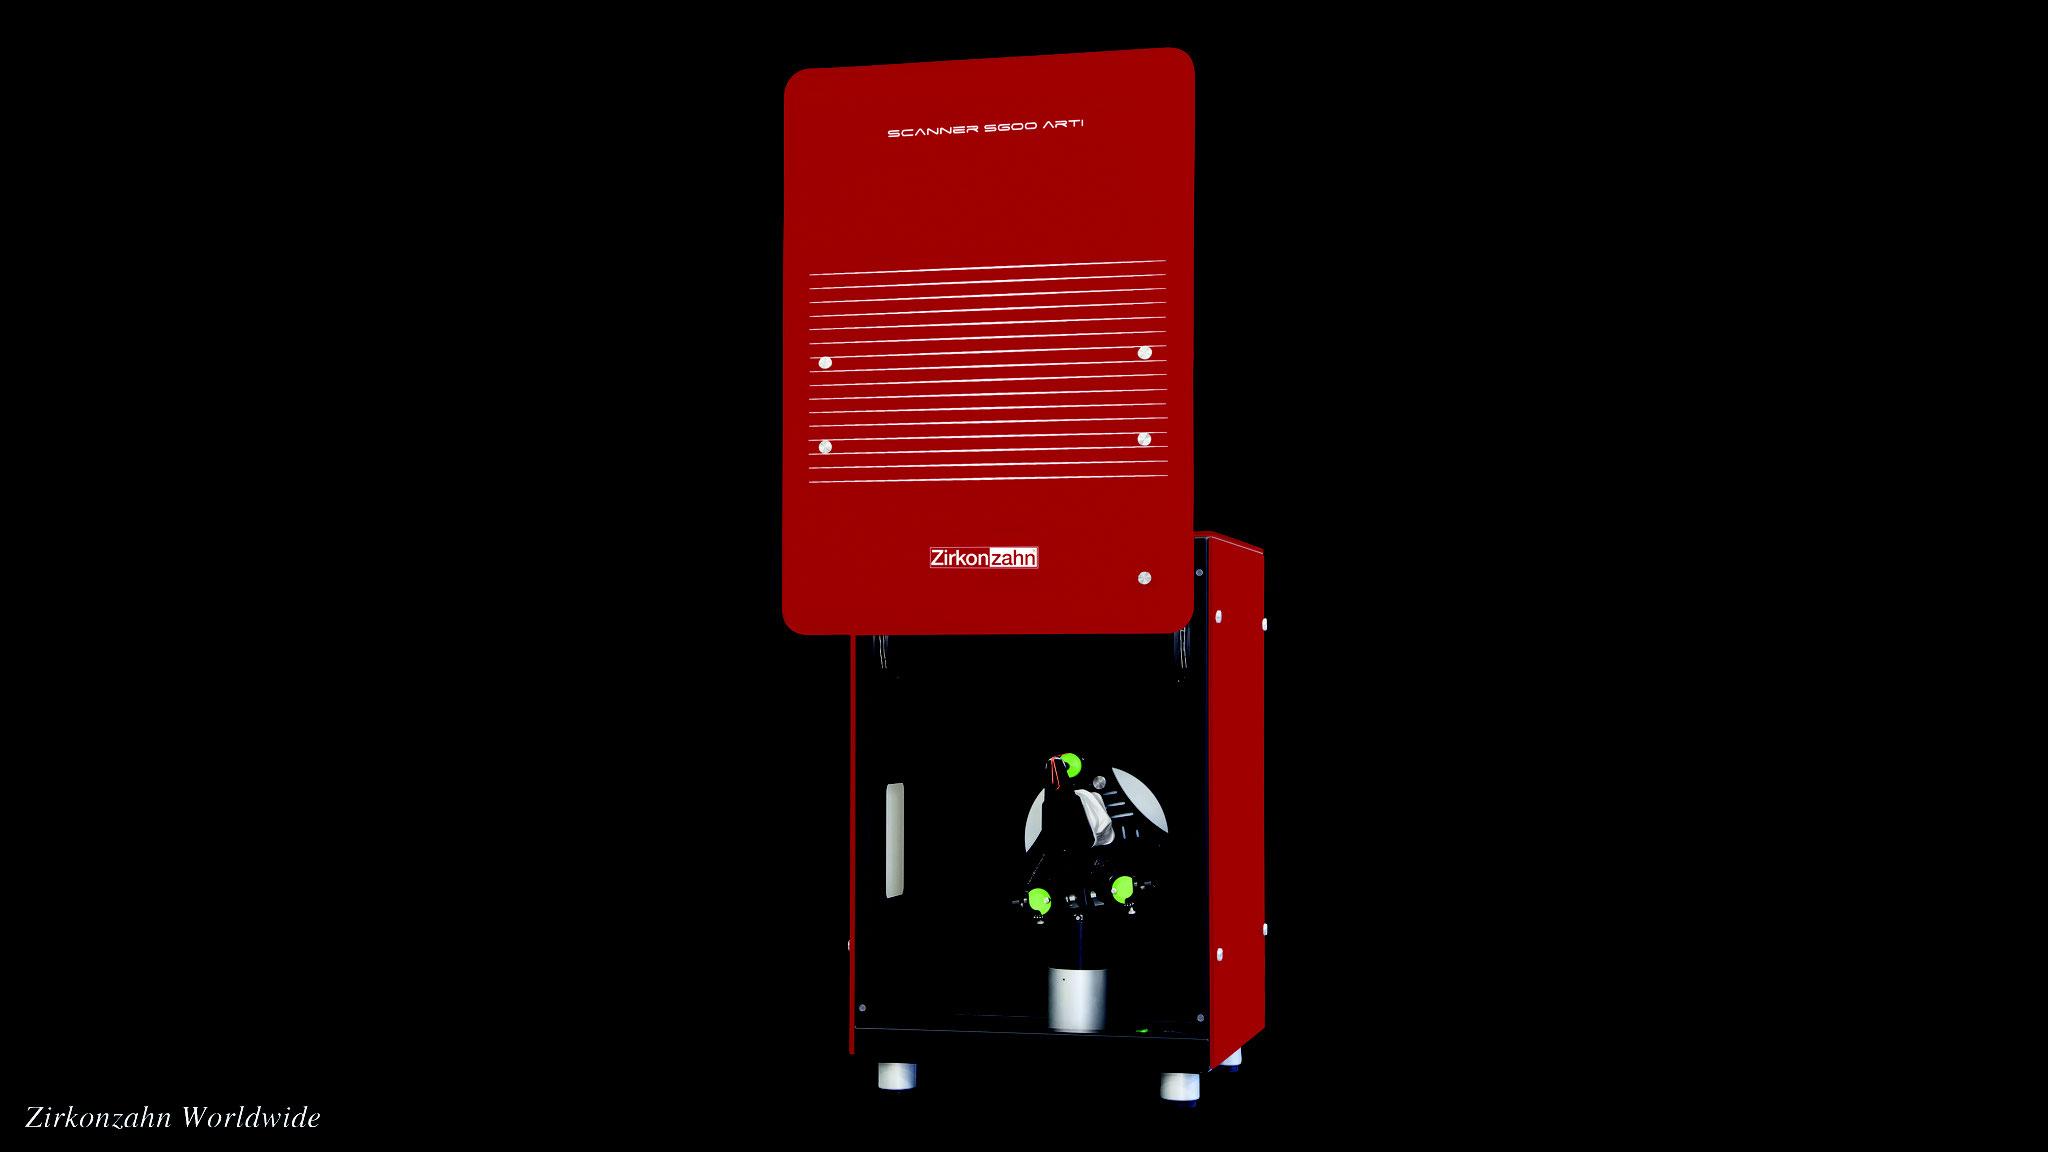 Zirkonzahn S600 Arti / Scanner